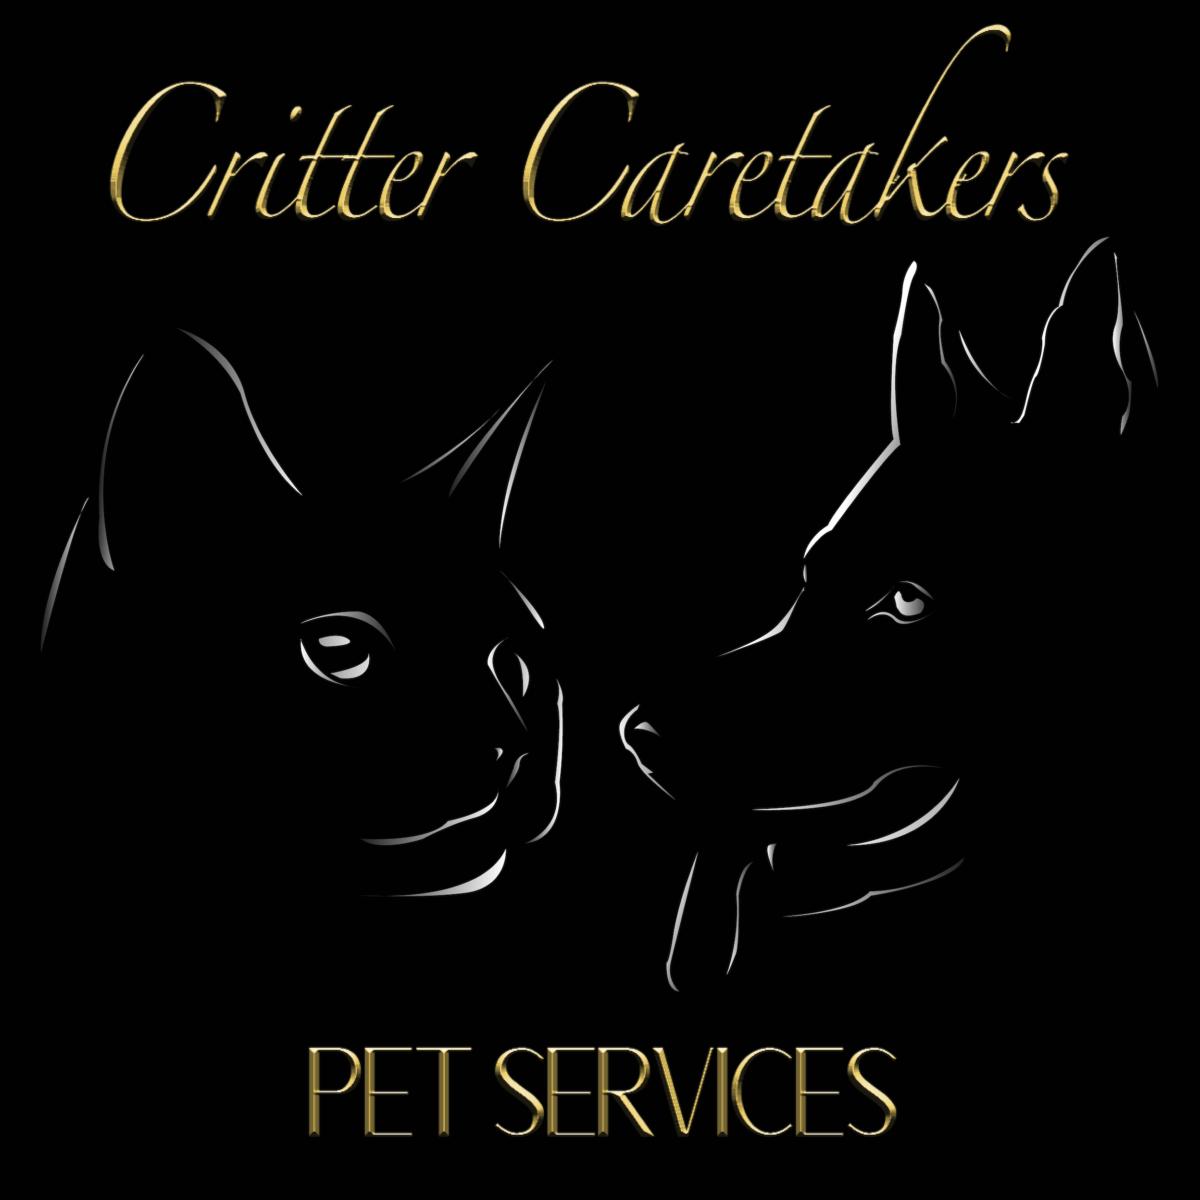 critter caretaker logo